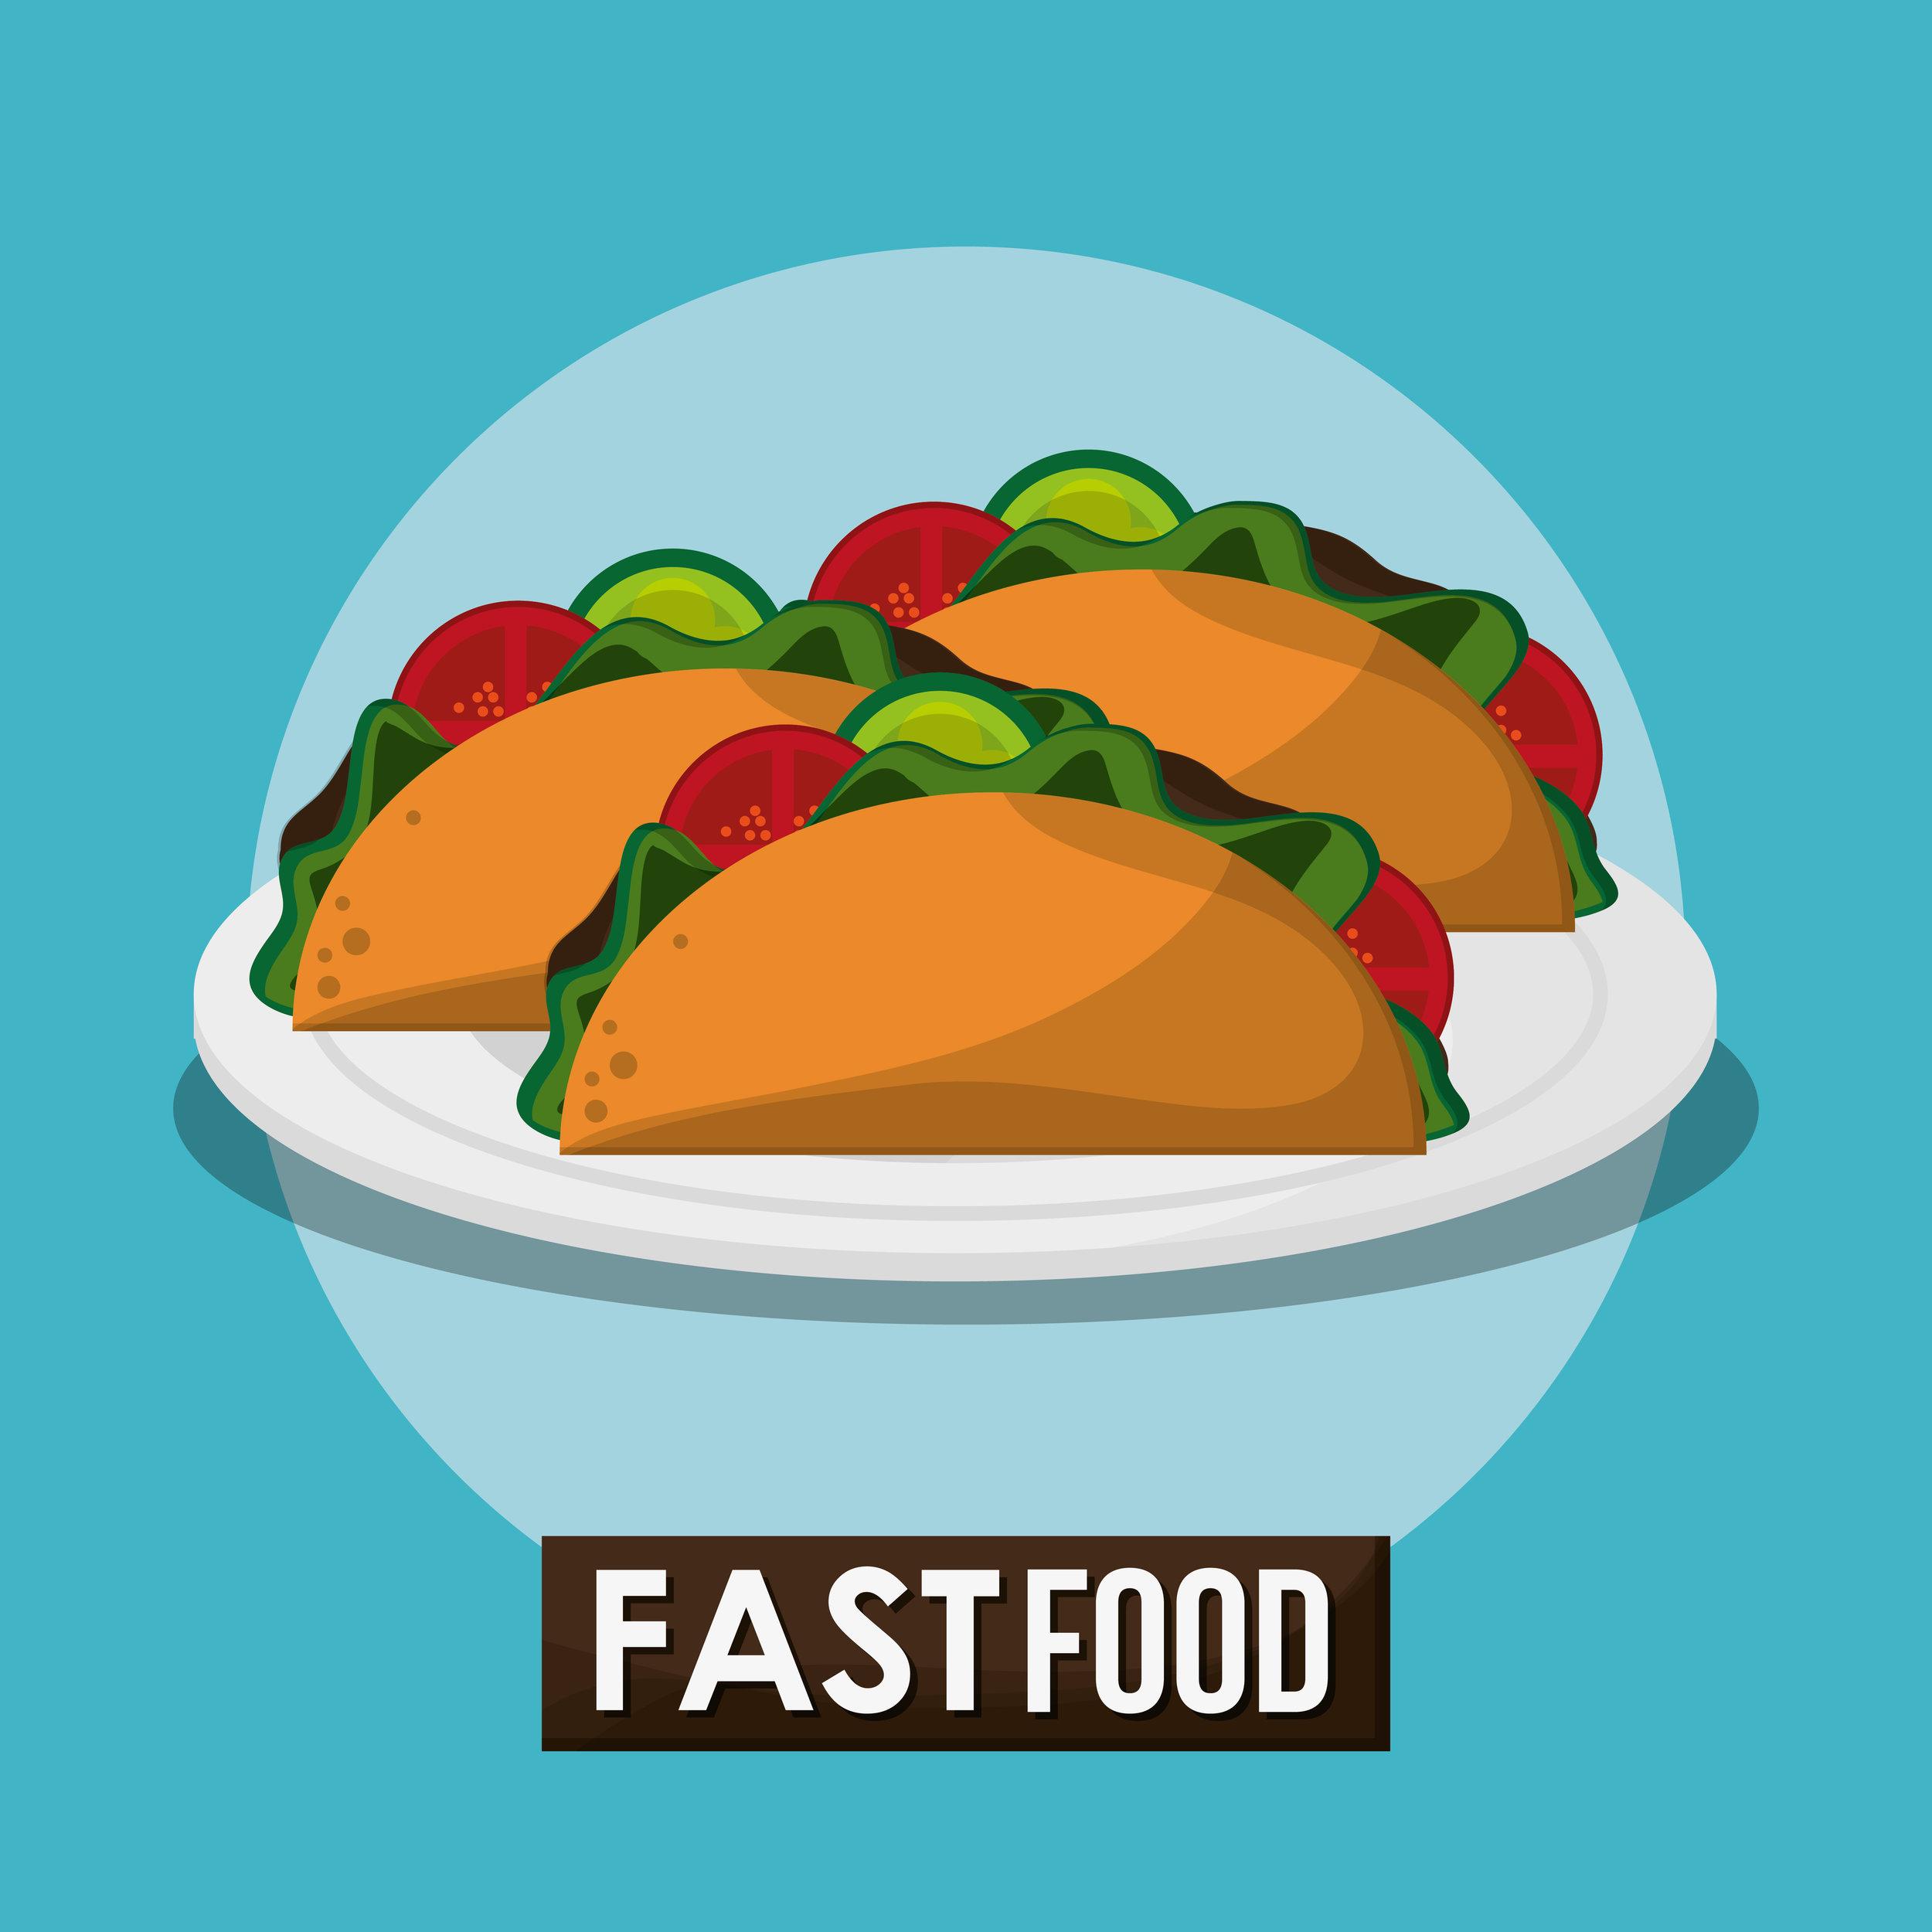 067278753-taco-and-fast-food-design.jpeg